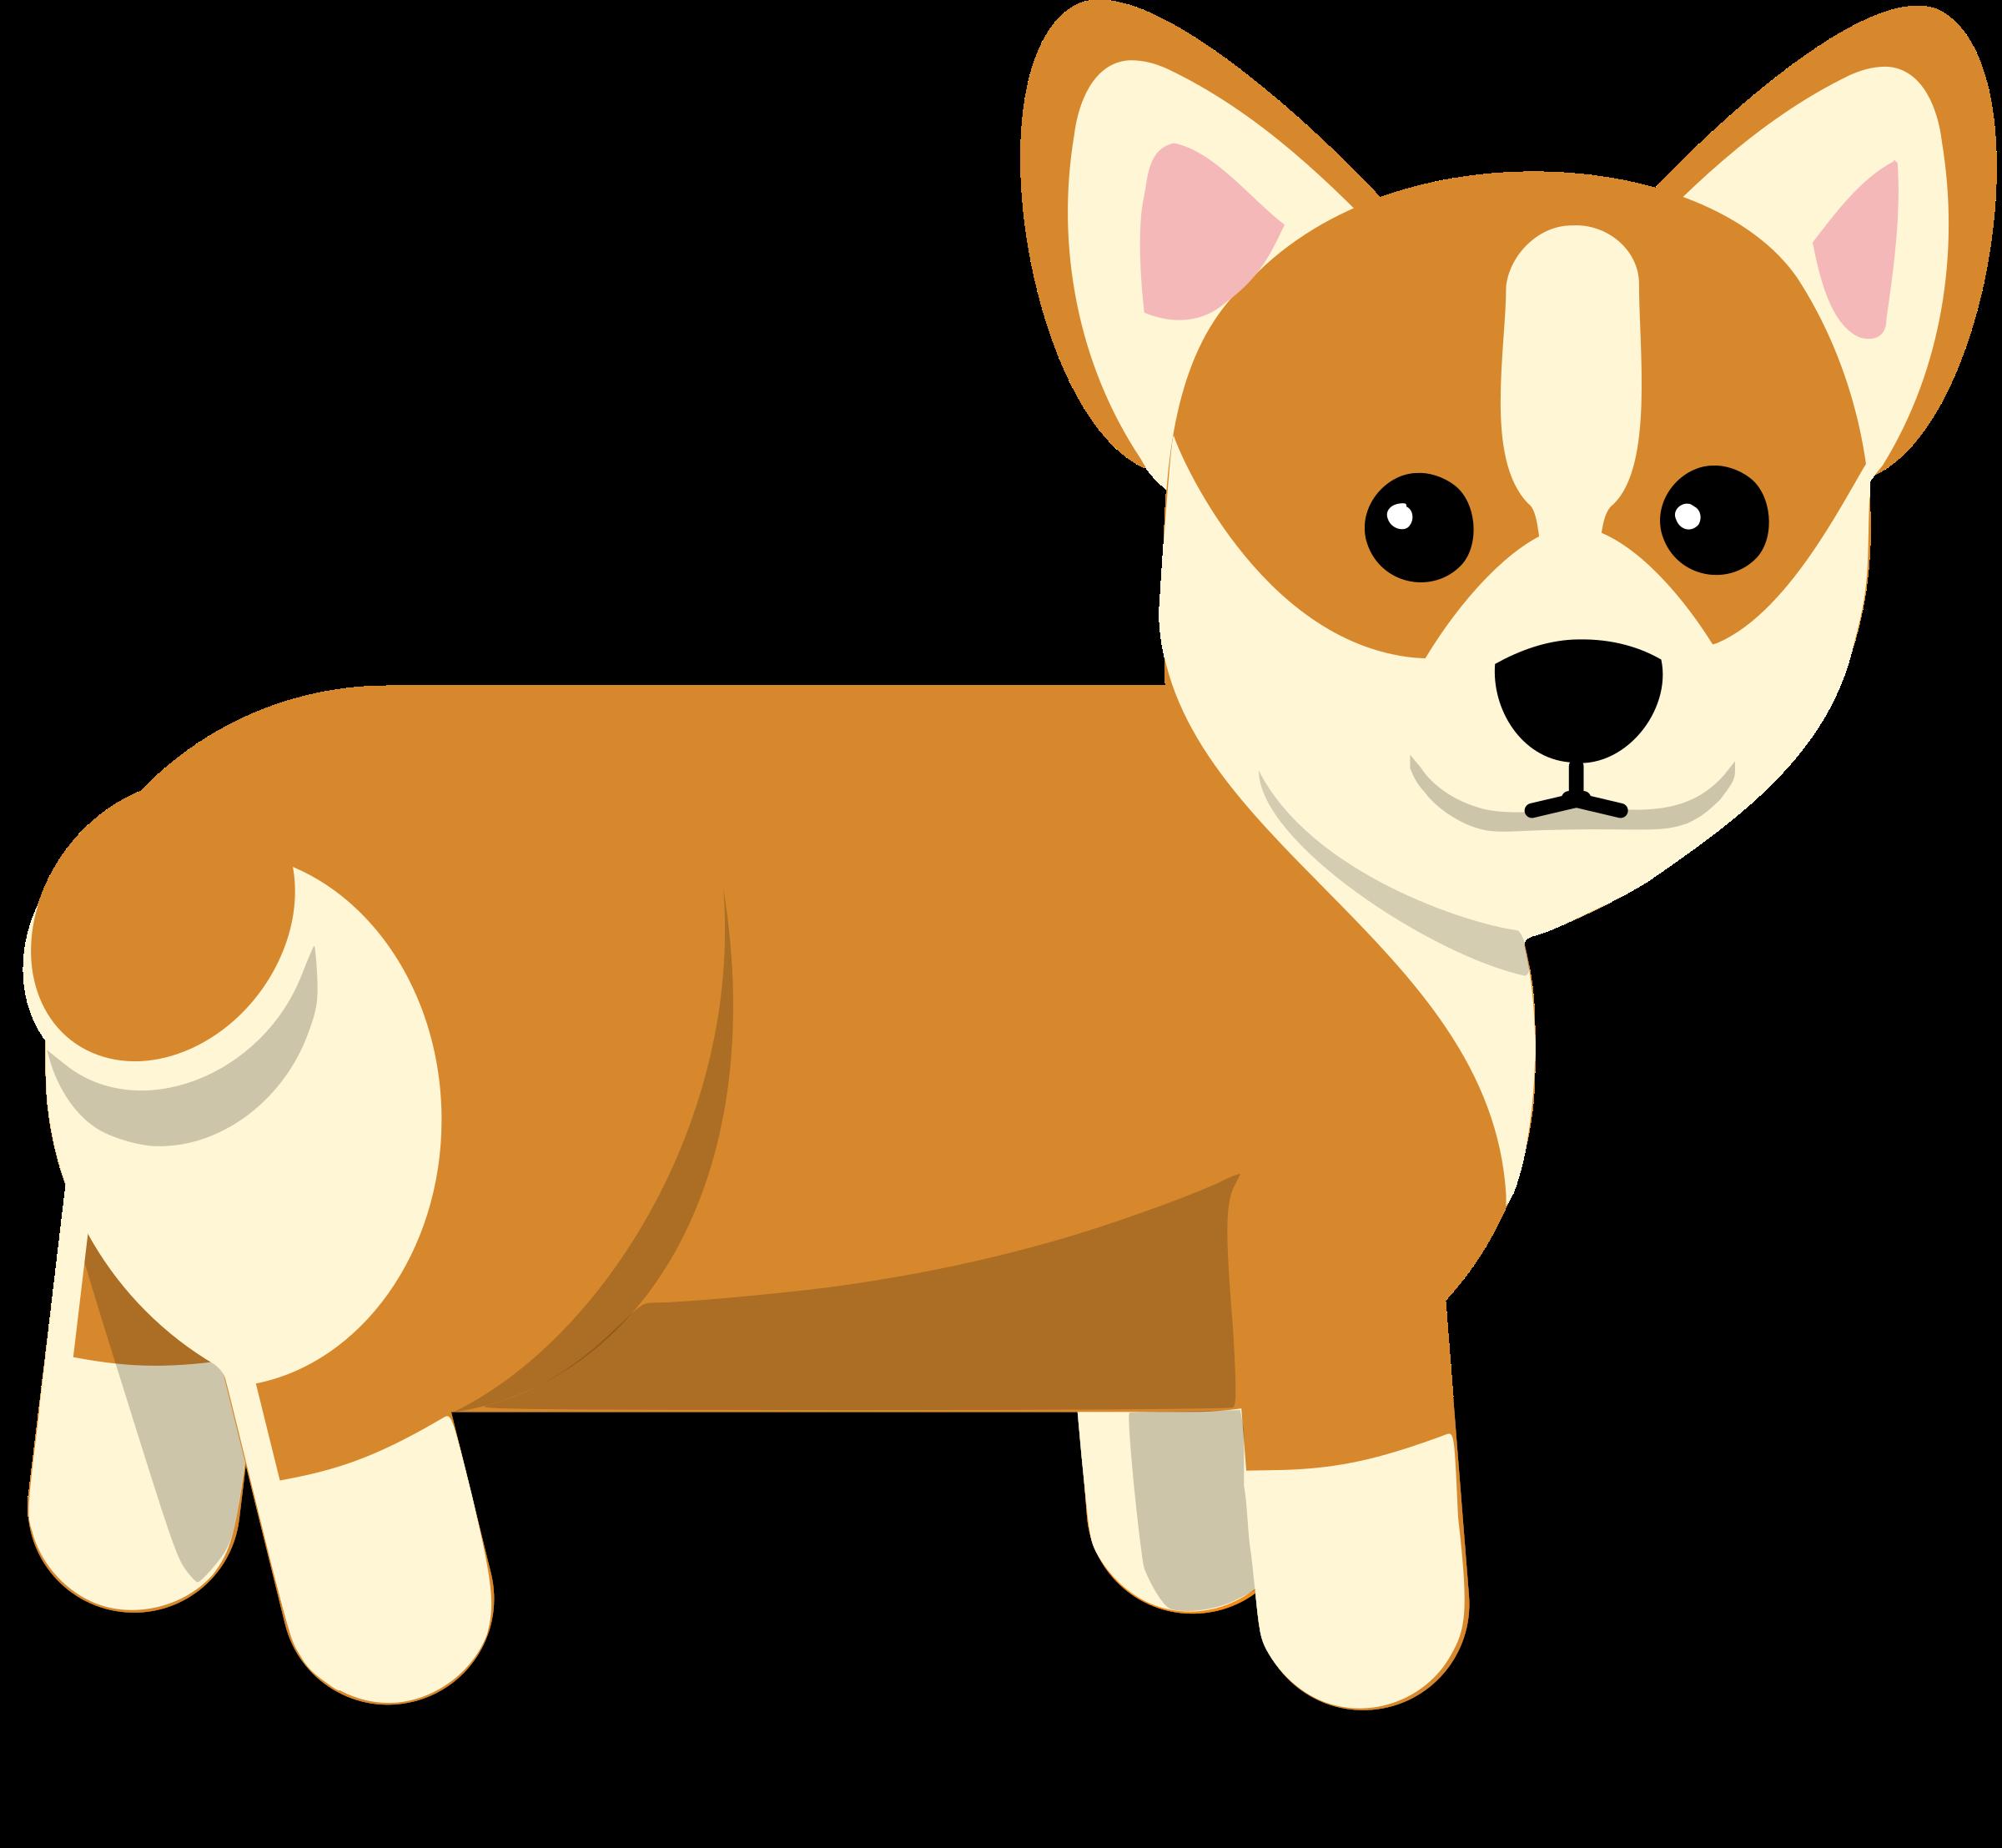 2400x2215 Corgi Dog Vector Clipart Image